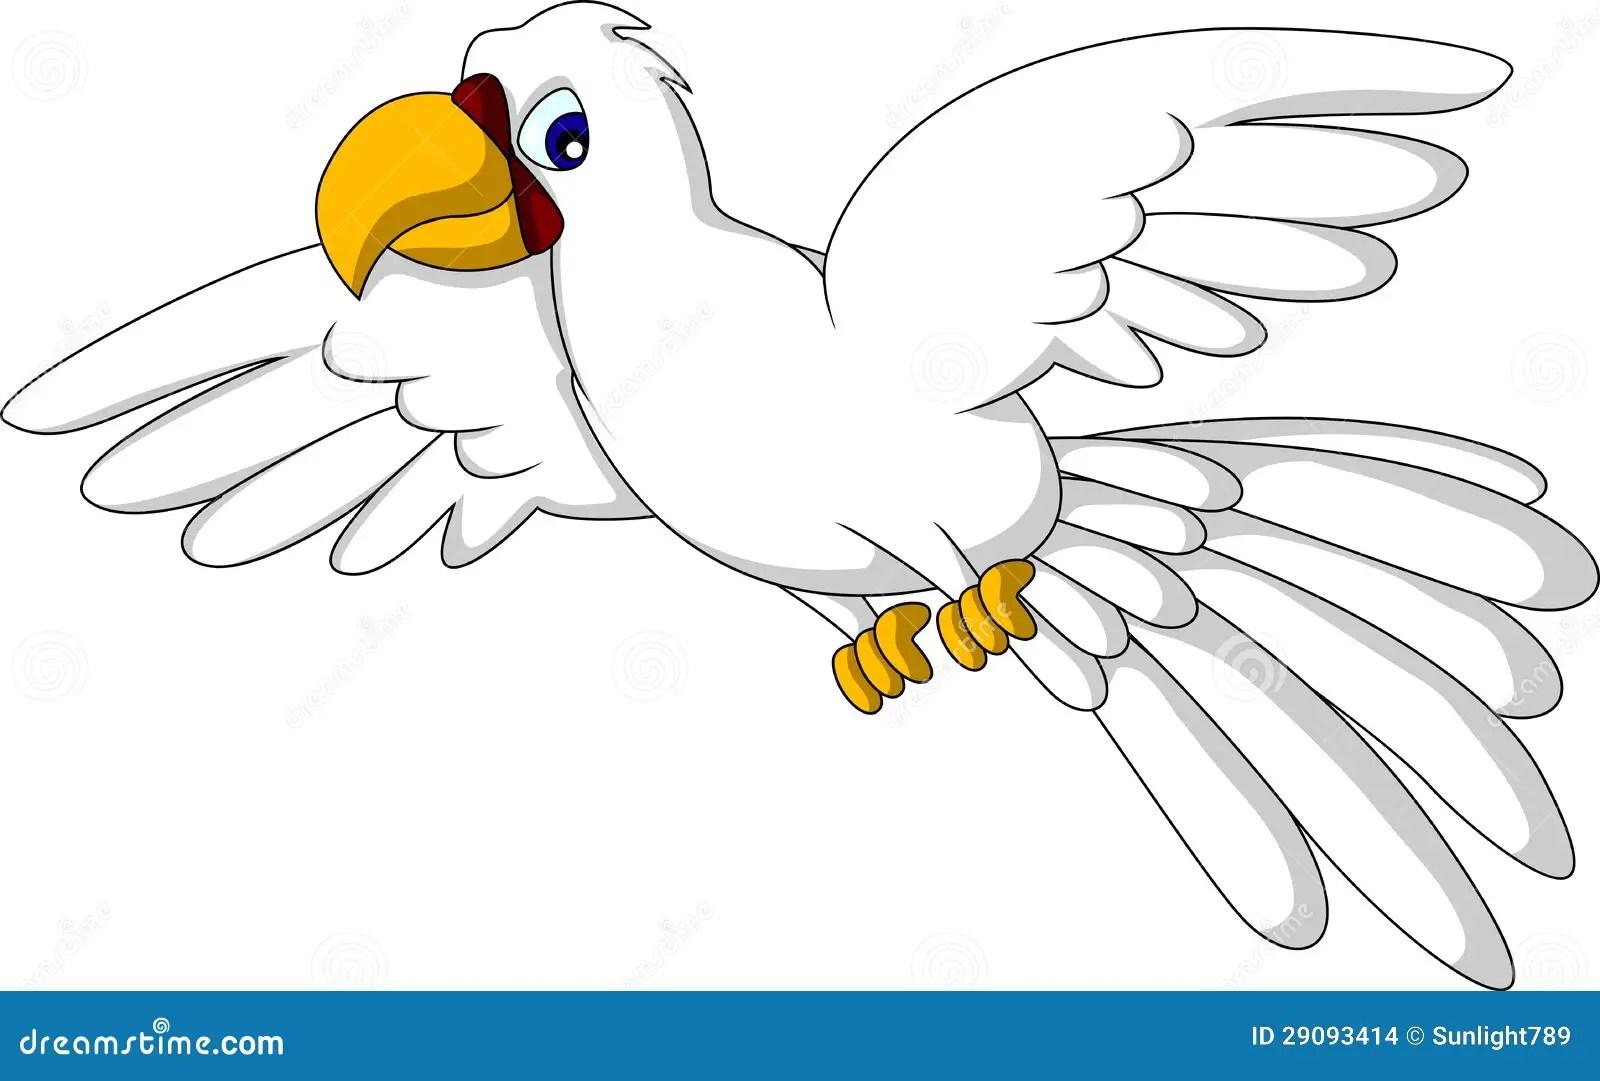 Cute White Parrot Cartoon Flying Stock Illustration